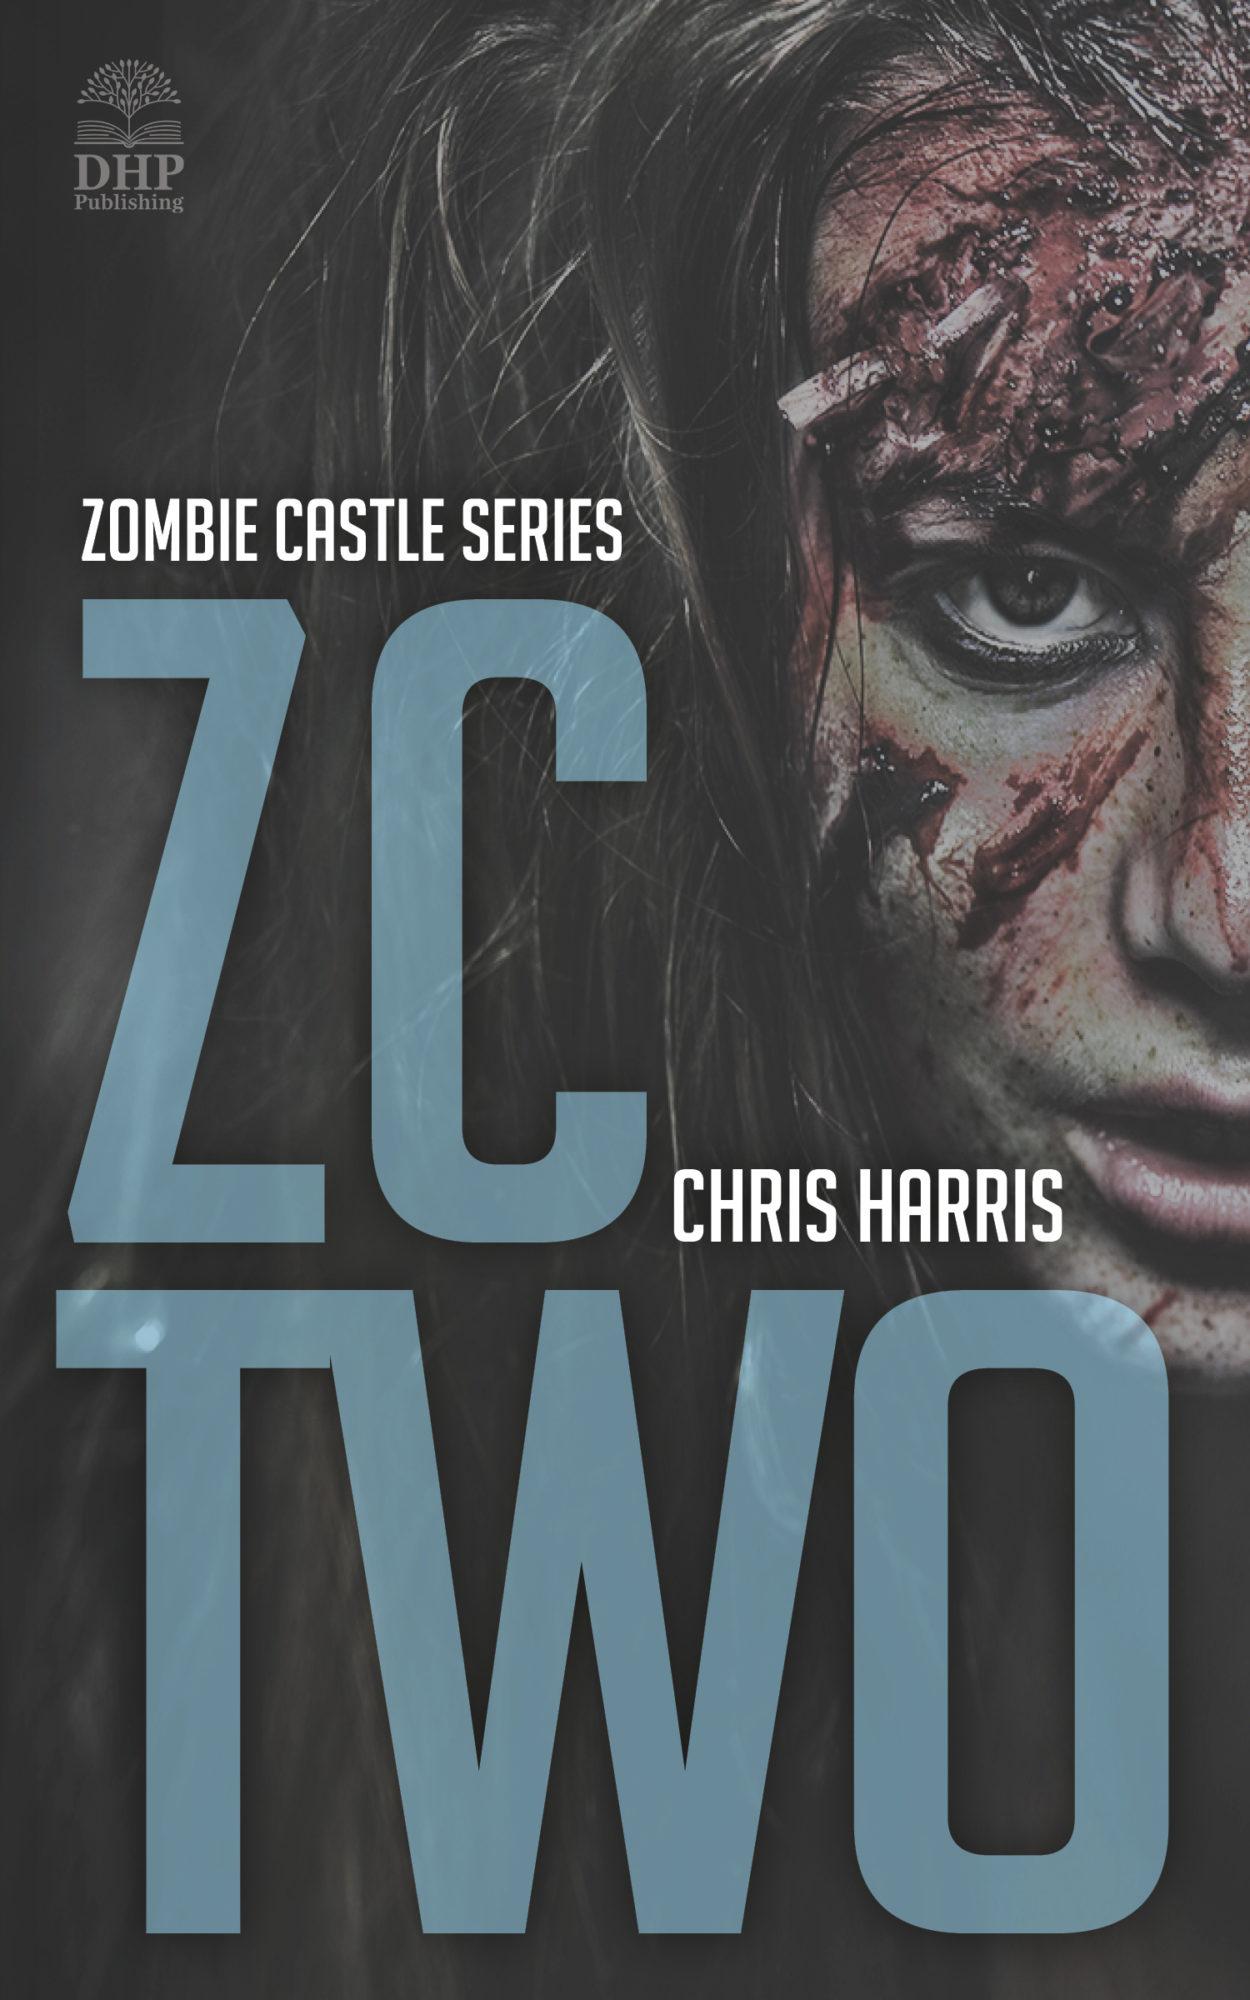 ZC TWO: Zombie Castle Series Book 2